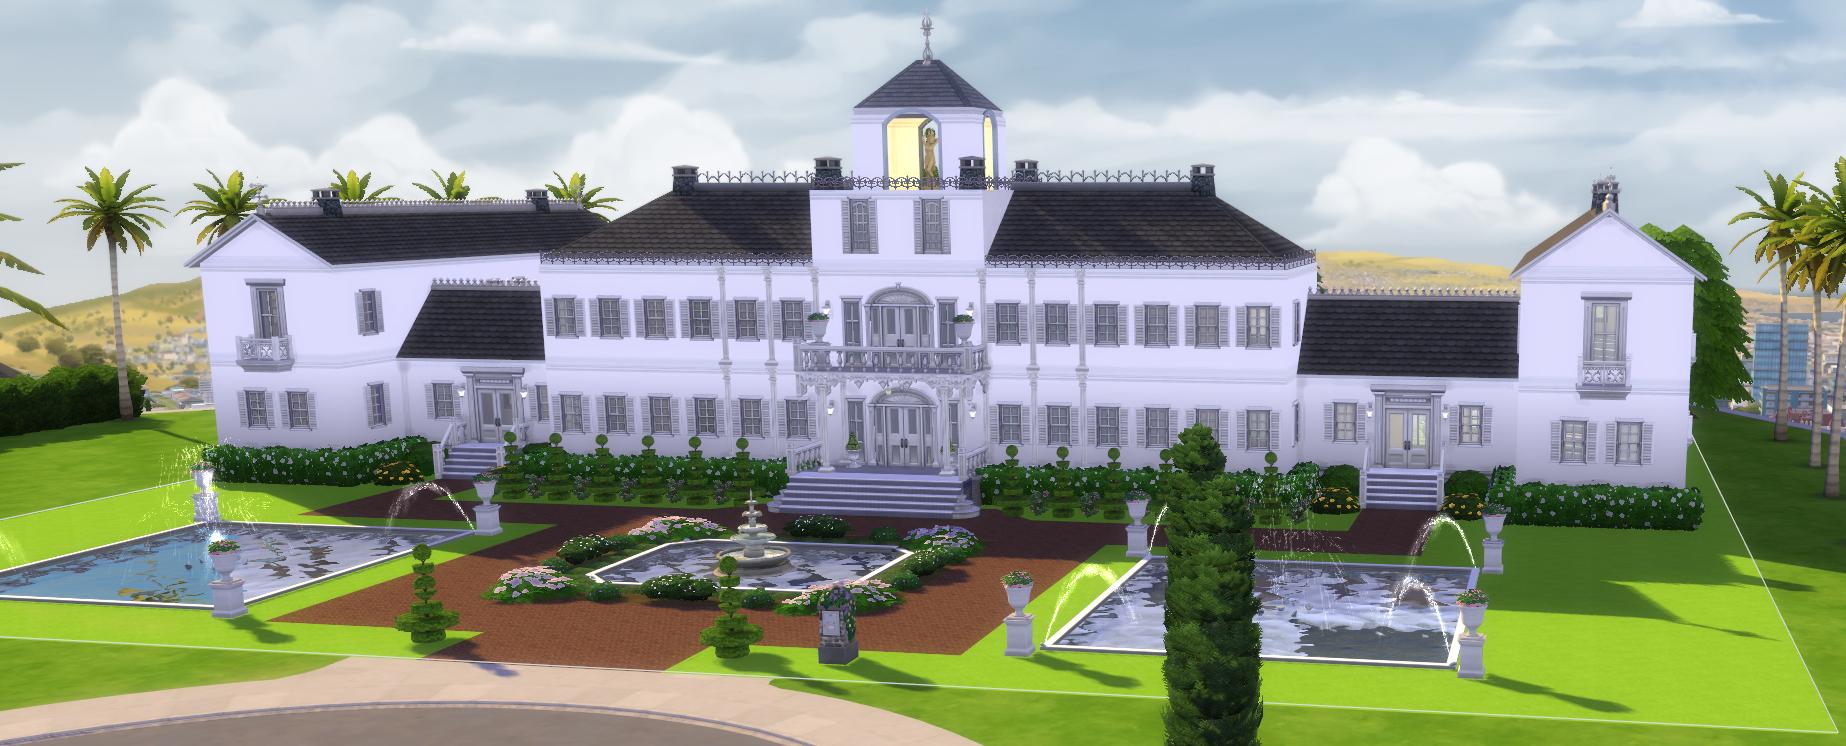 Дворец Соестдийк